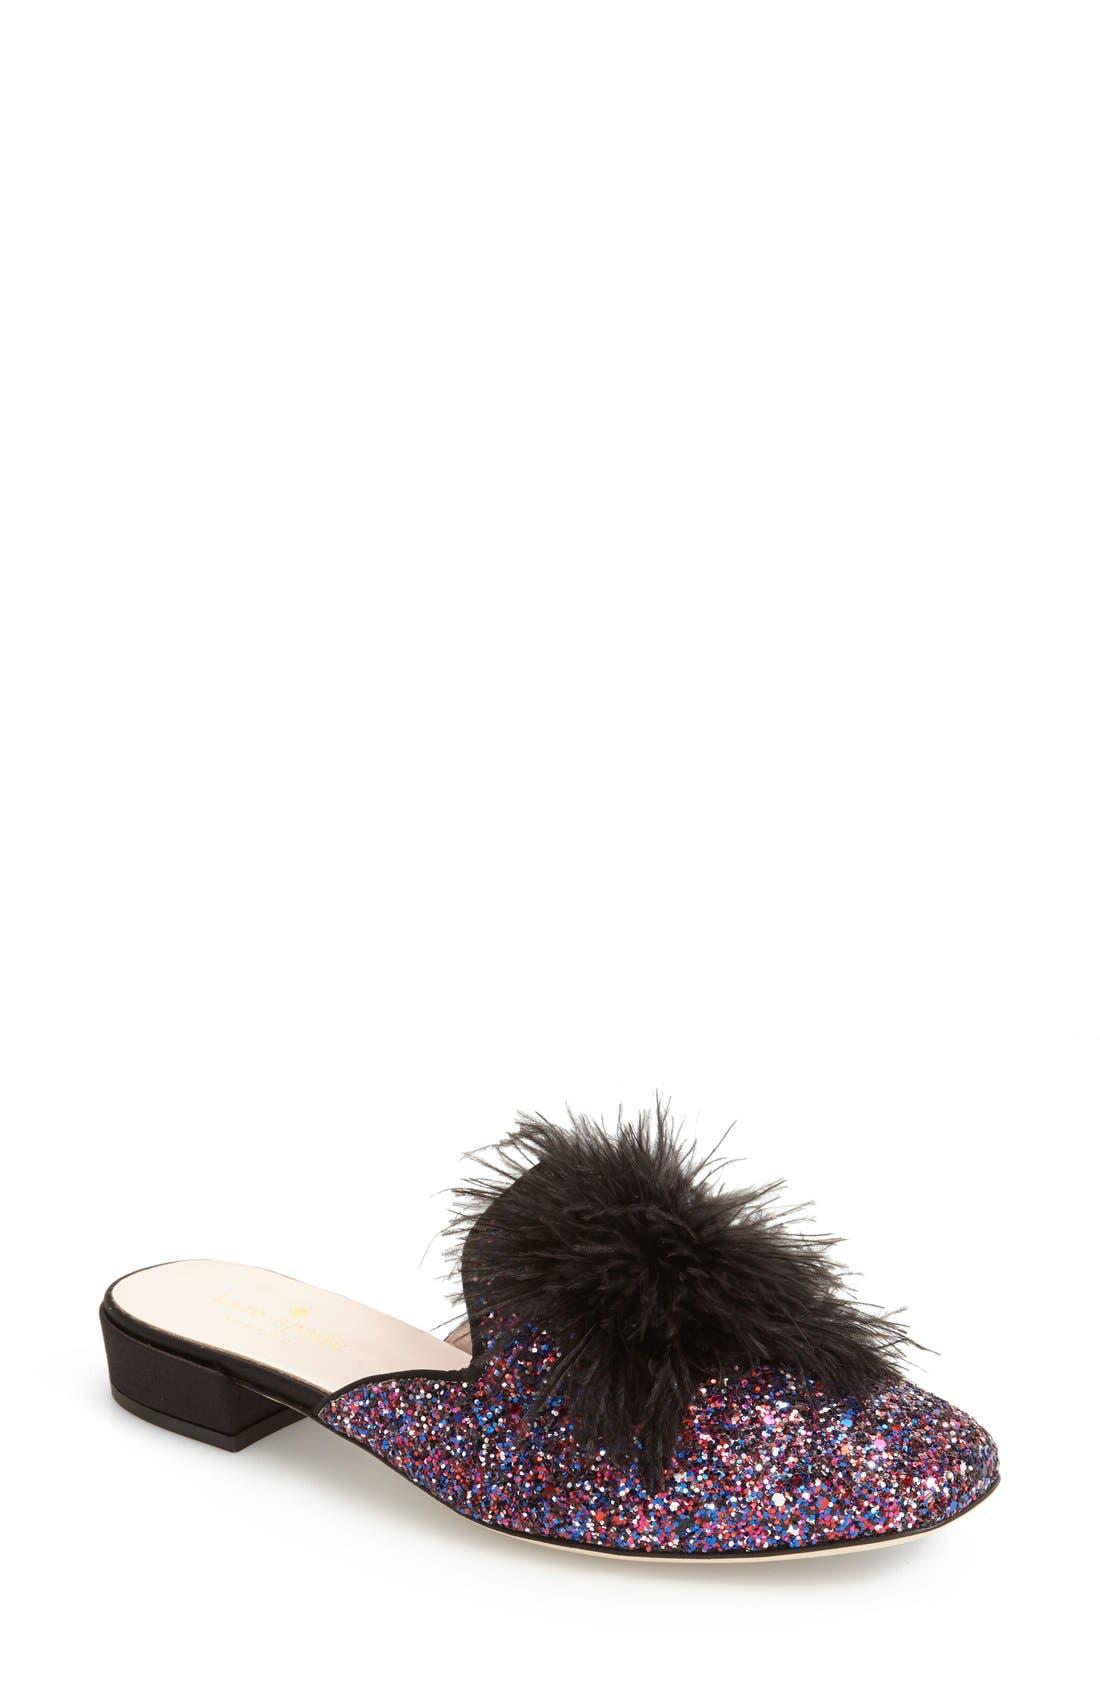 Alternate Image 1 Selected - kate spade new york gala mule loafer (Women)